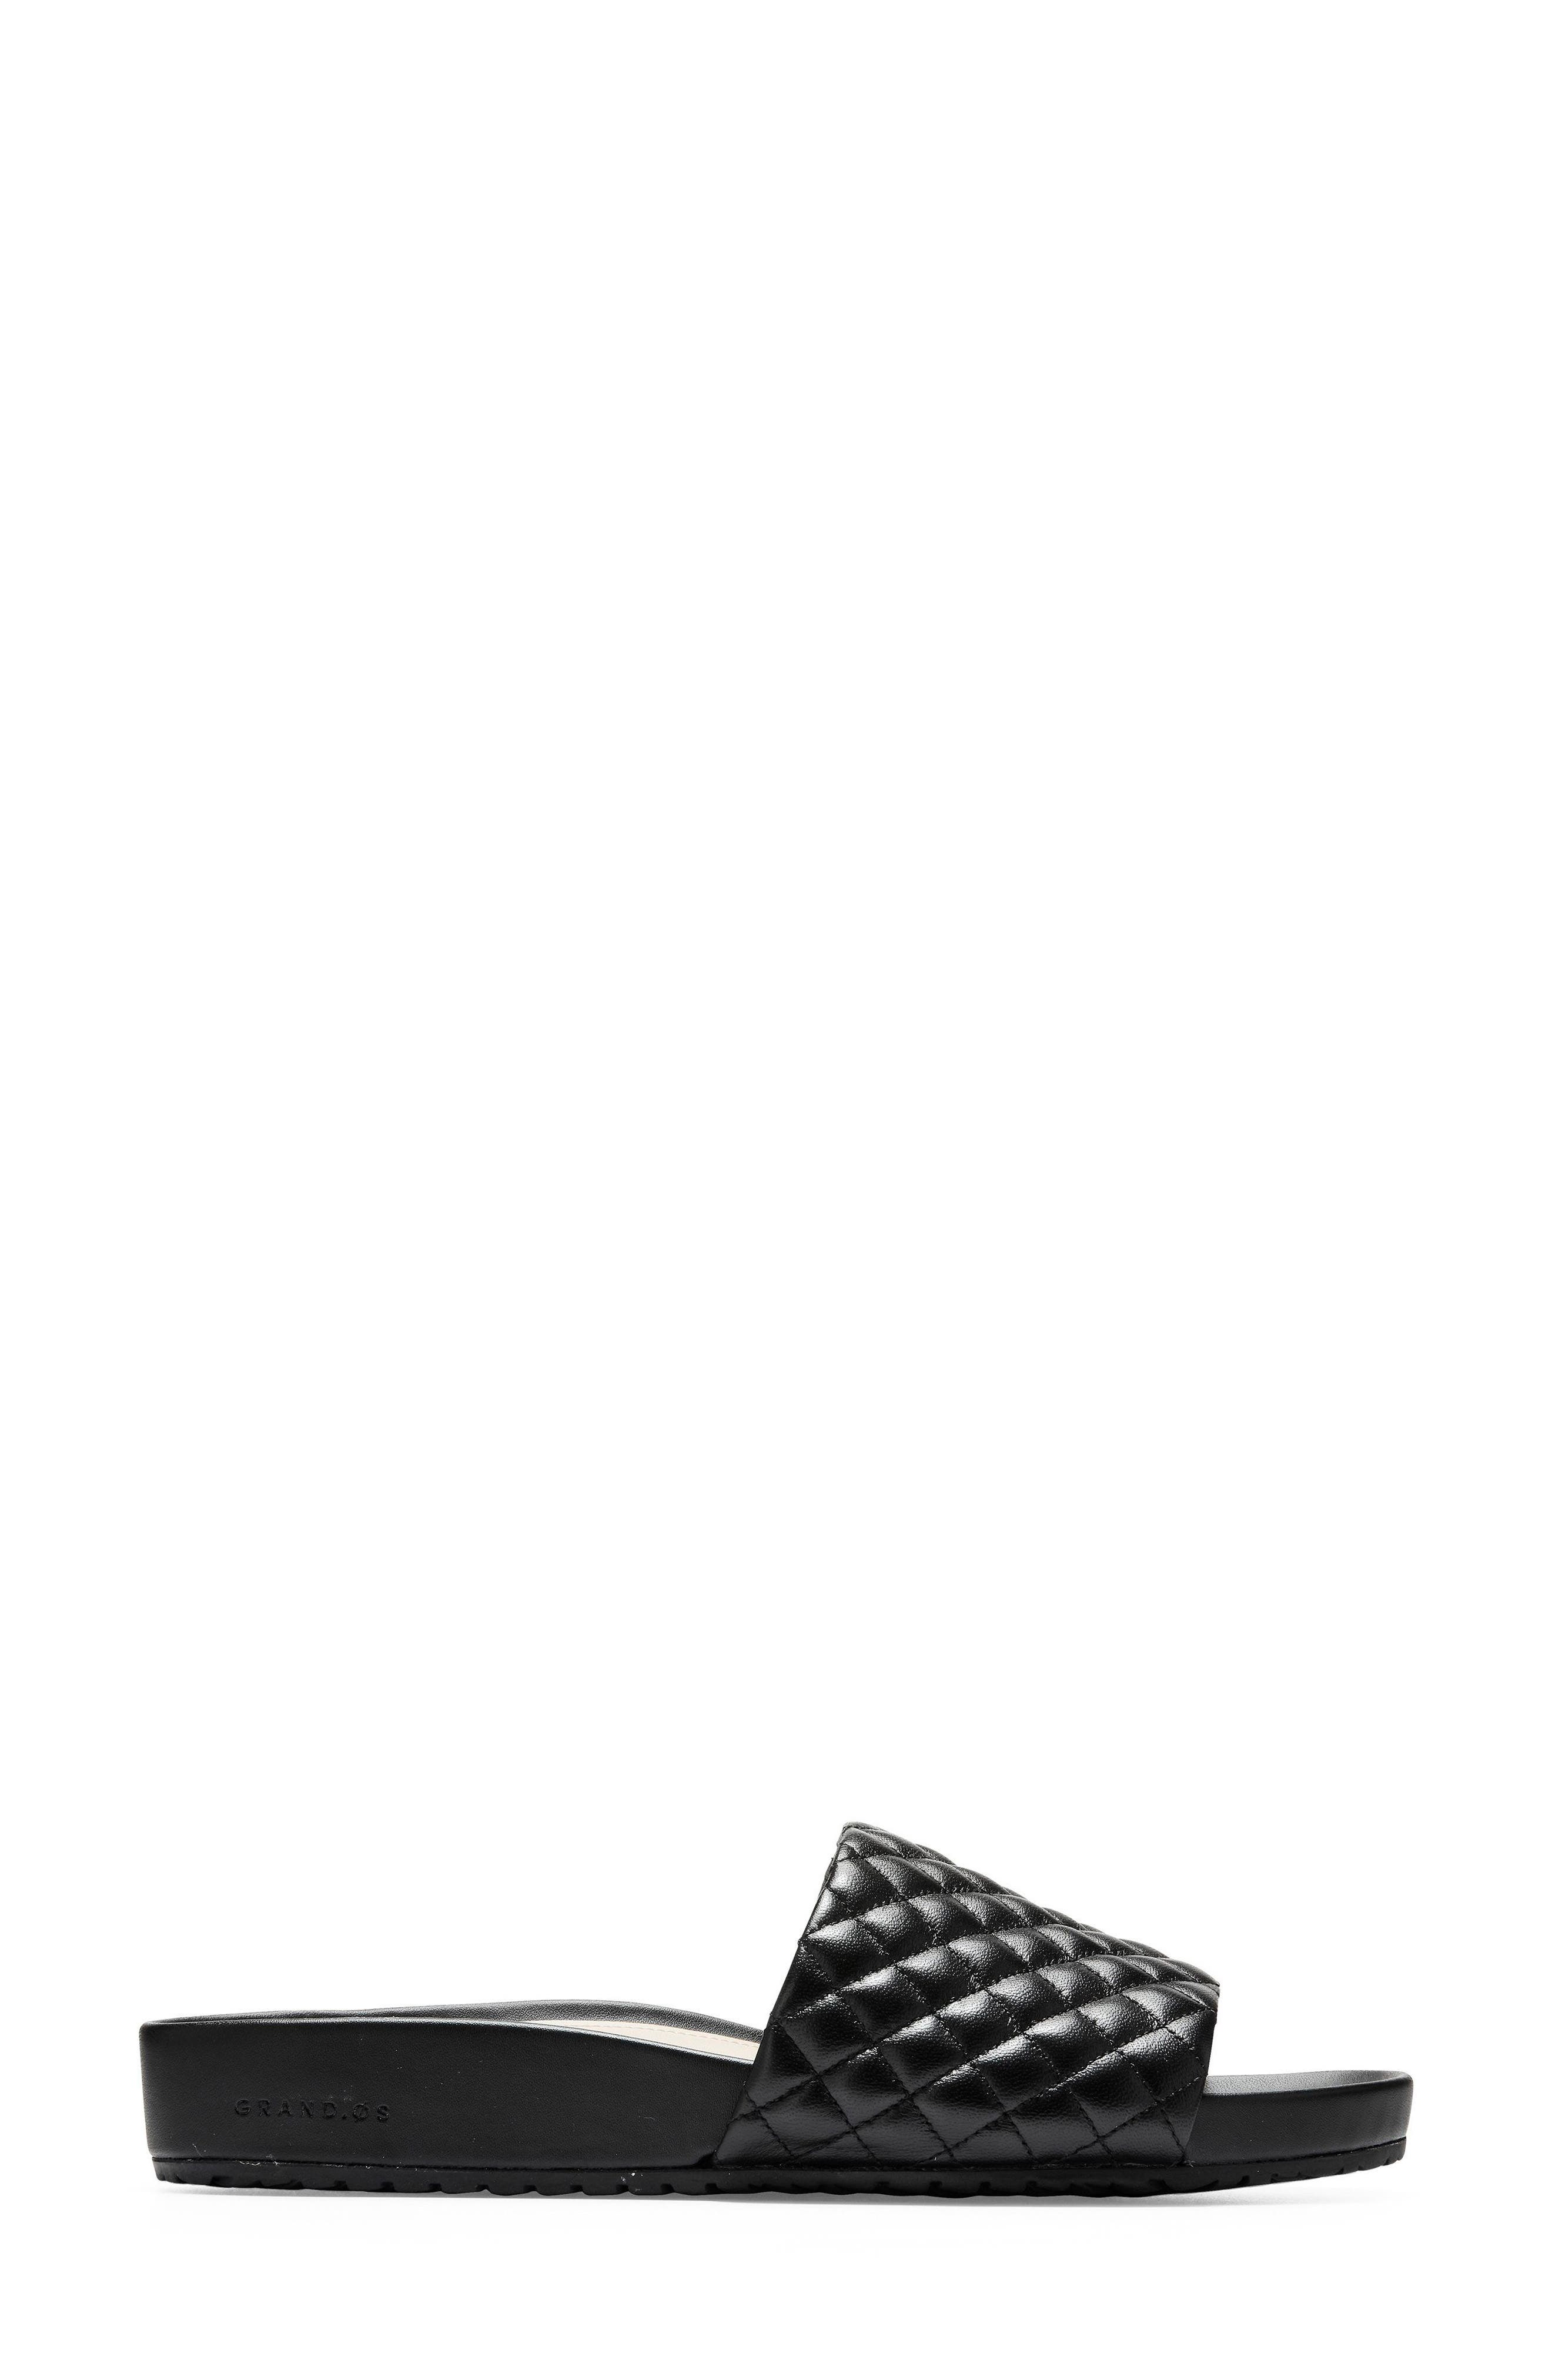 Pinch Montauk Slide Sandal,                             Alternate thumbnail 3, color,                             Black Quilted Leather